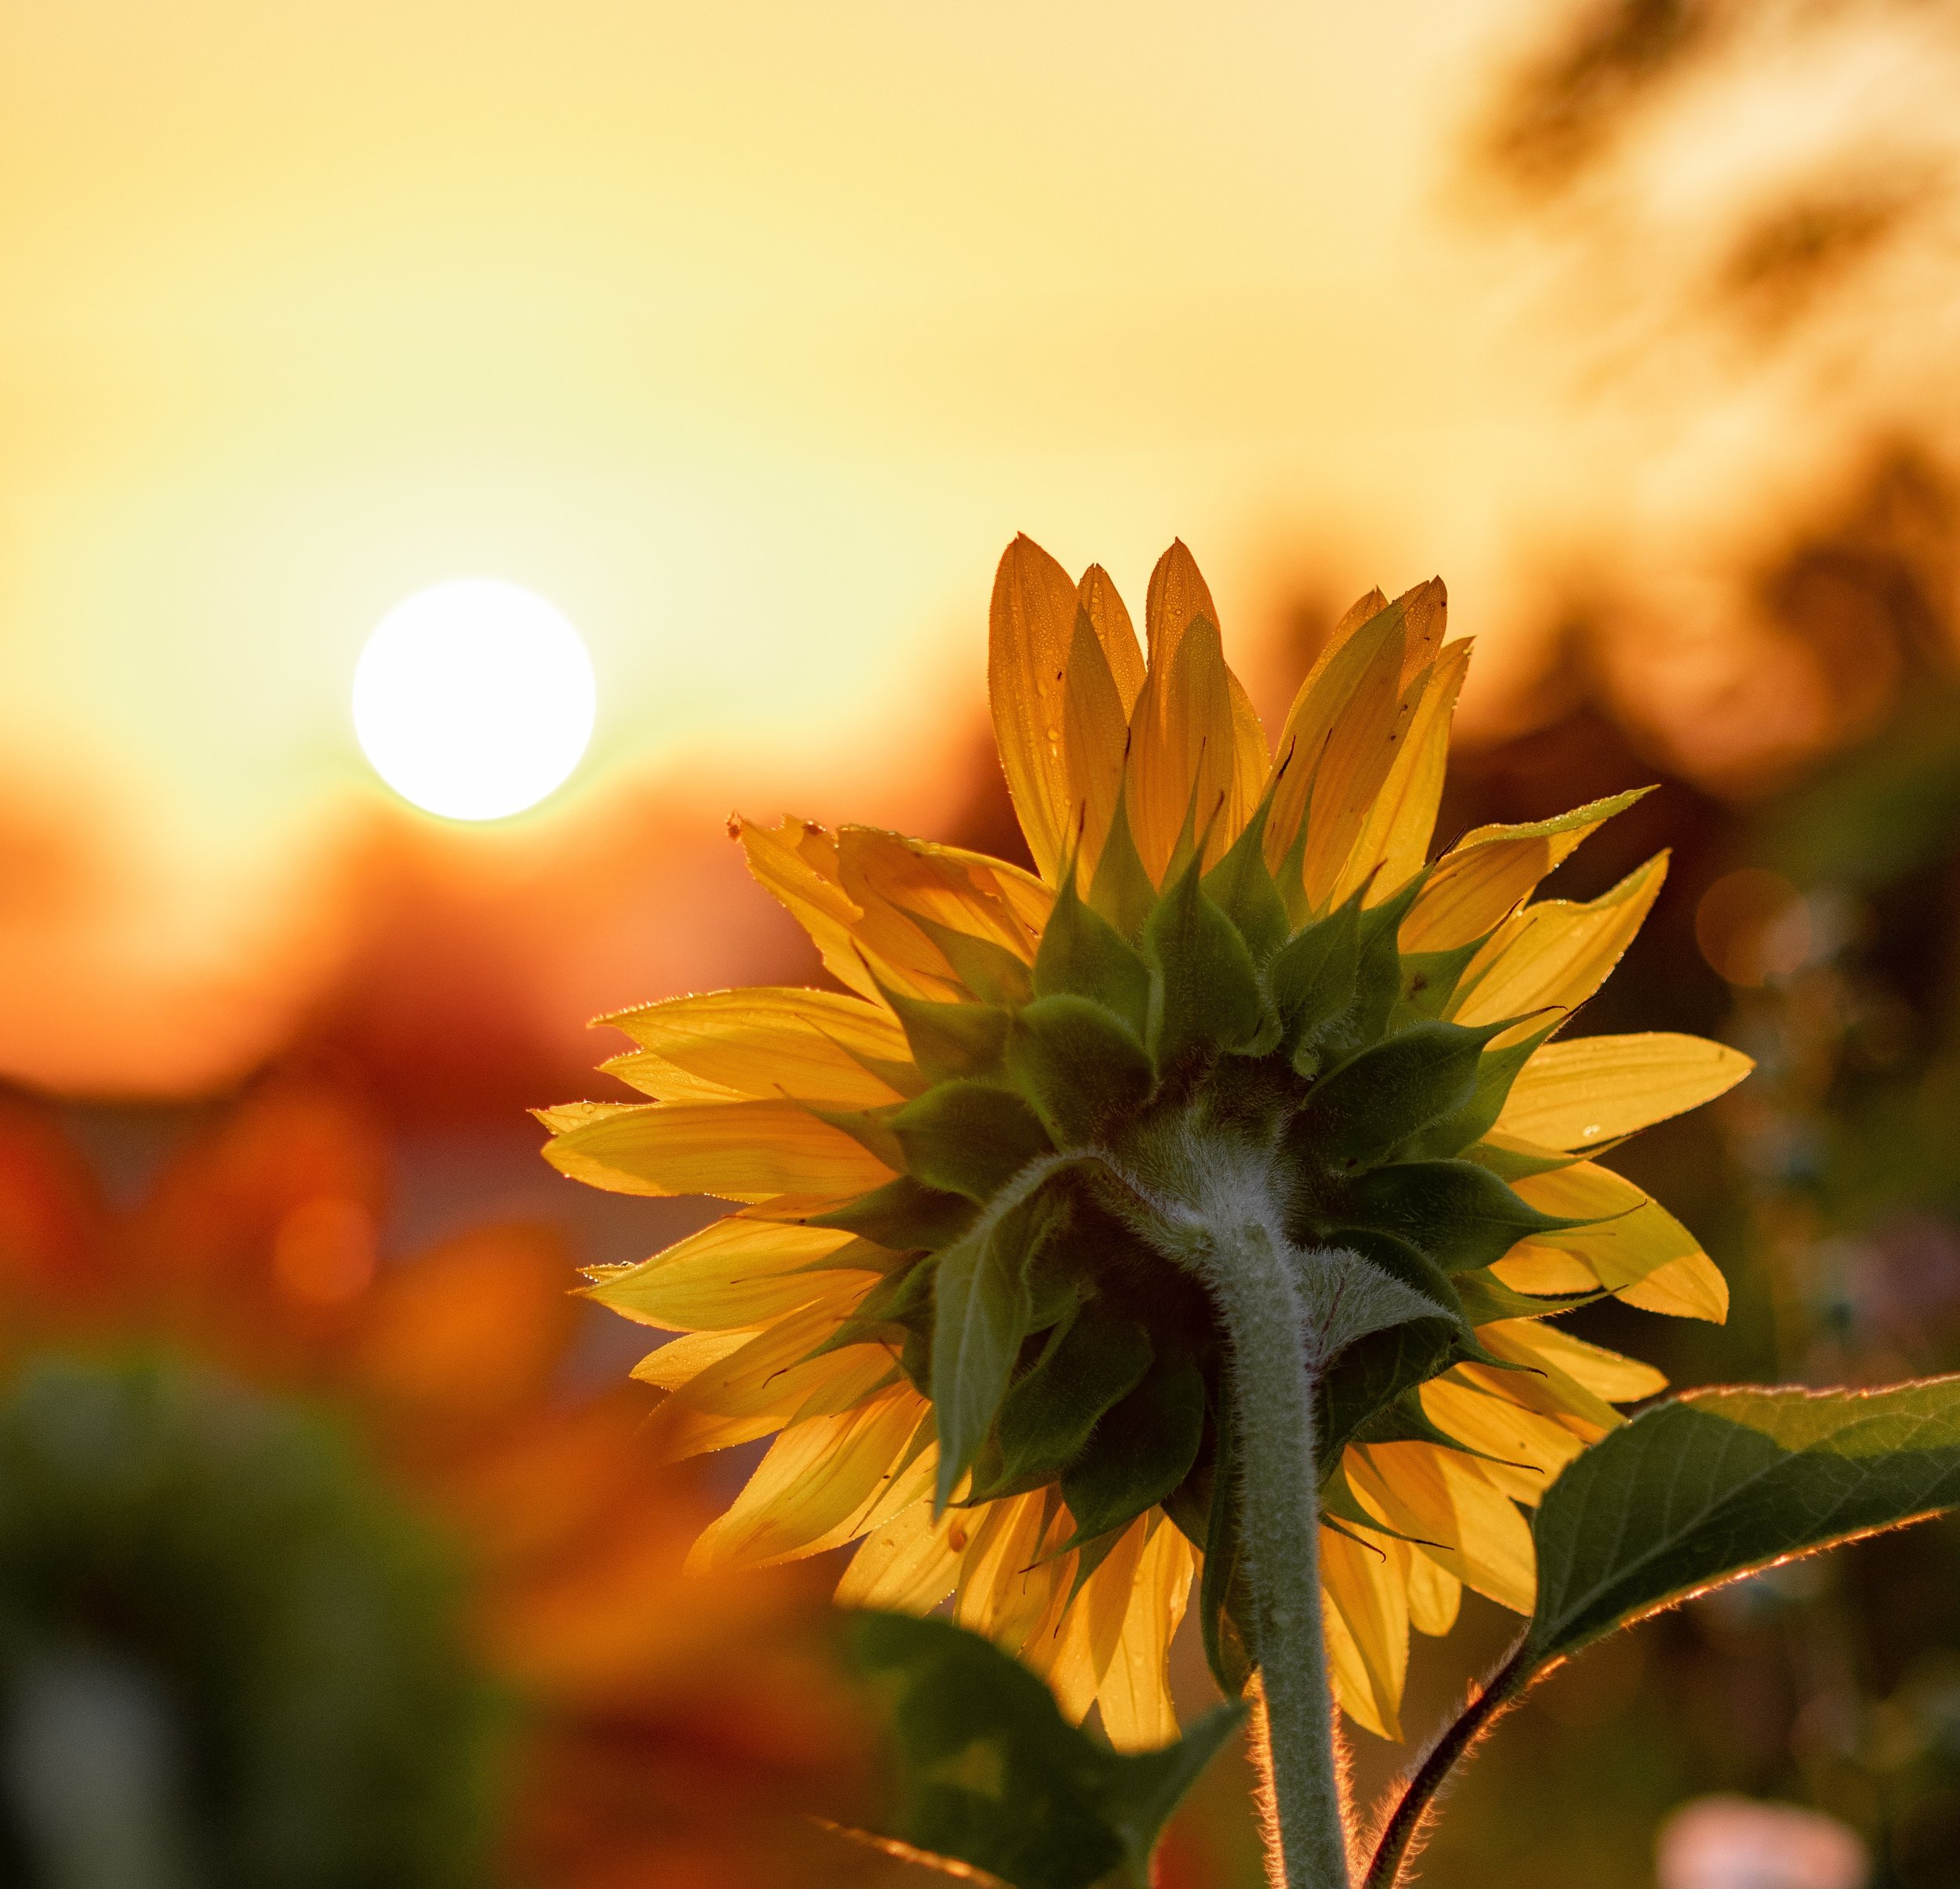 stephen-thaddeus-wawryk-luna-maha-sunflower.jpg